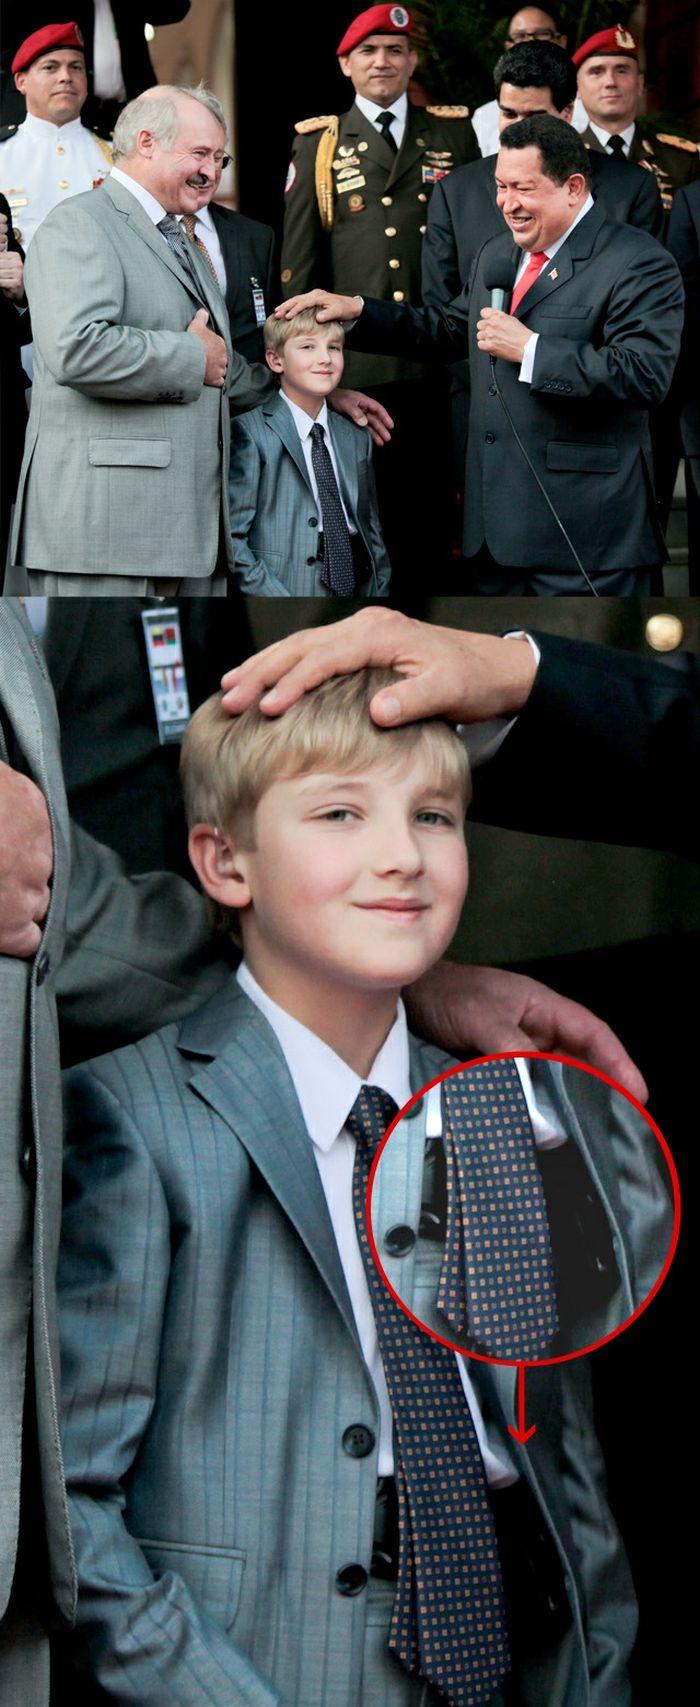 Коля Лукашенко ходит с пистолетом (4 фото)